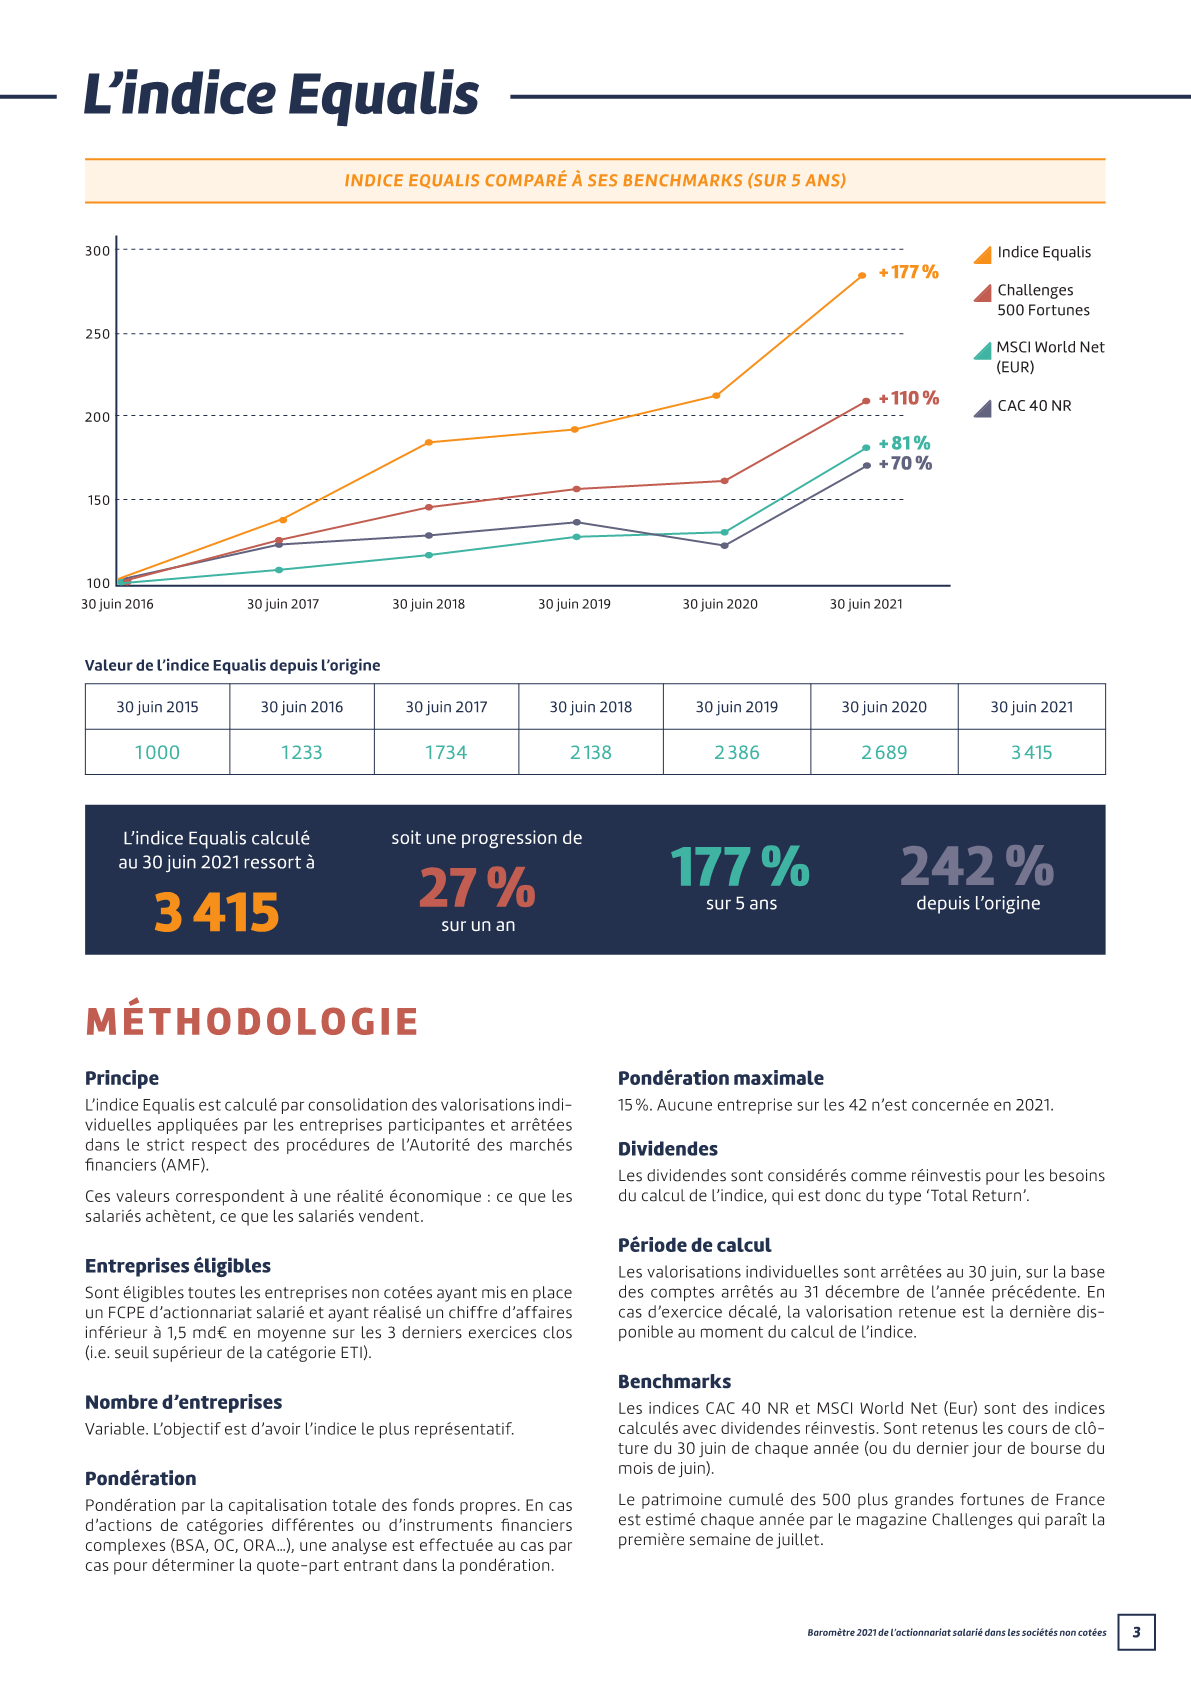 Baromètre_Equalis_Rapport_2021_web3